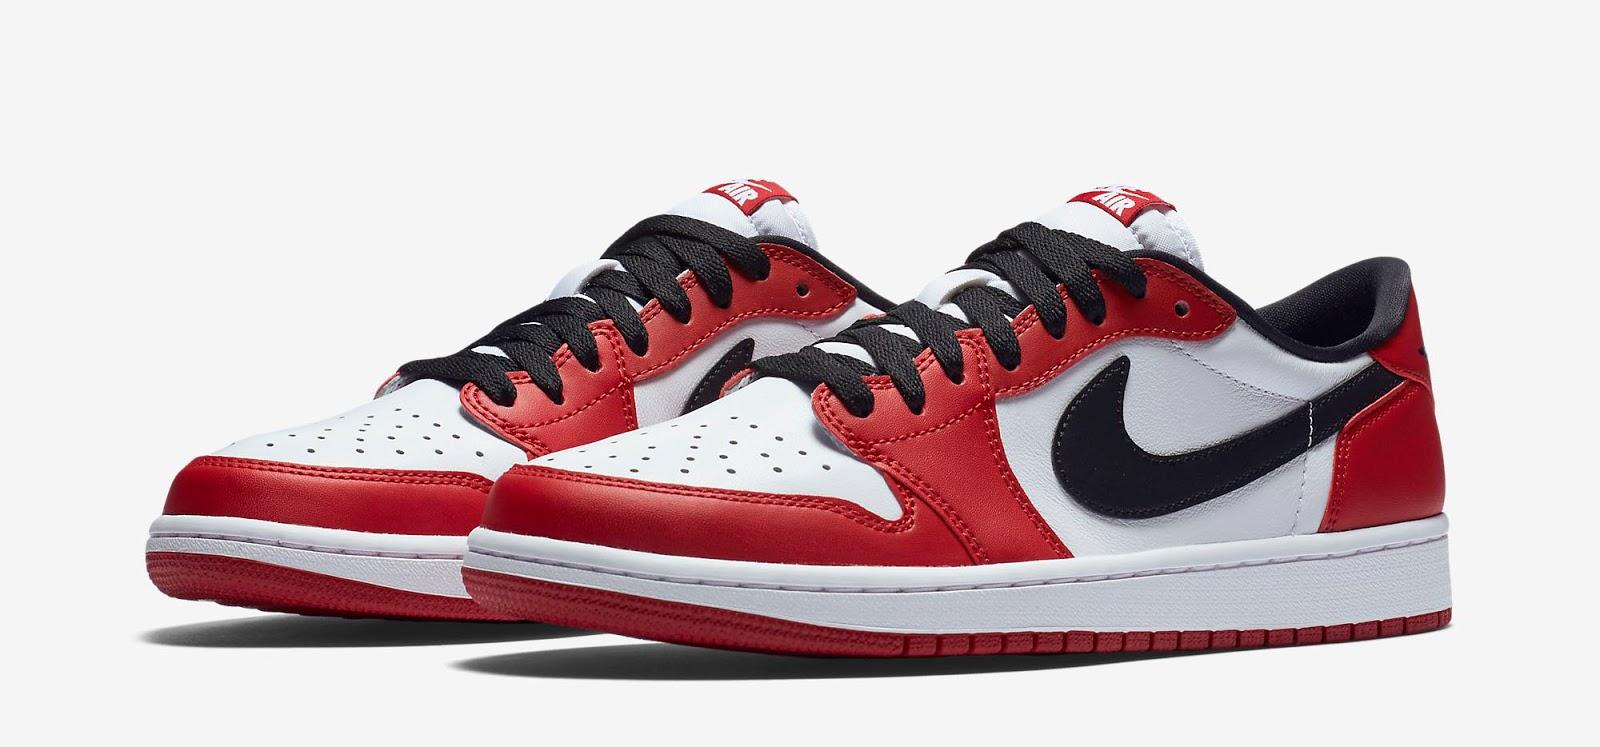 release date 7c412 3698c aclaramiento perfecta genuina línea barata Nike Air Jordan 1 Retro 6s Bajas  Del Equipo Universitario Negro